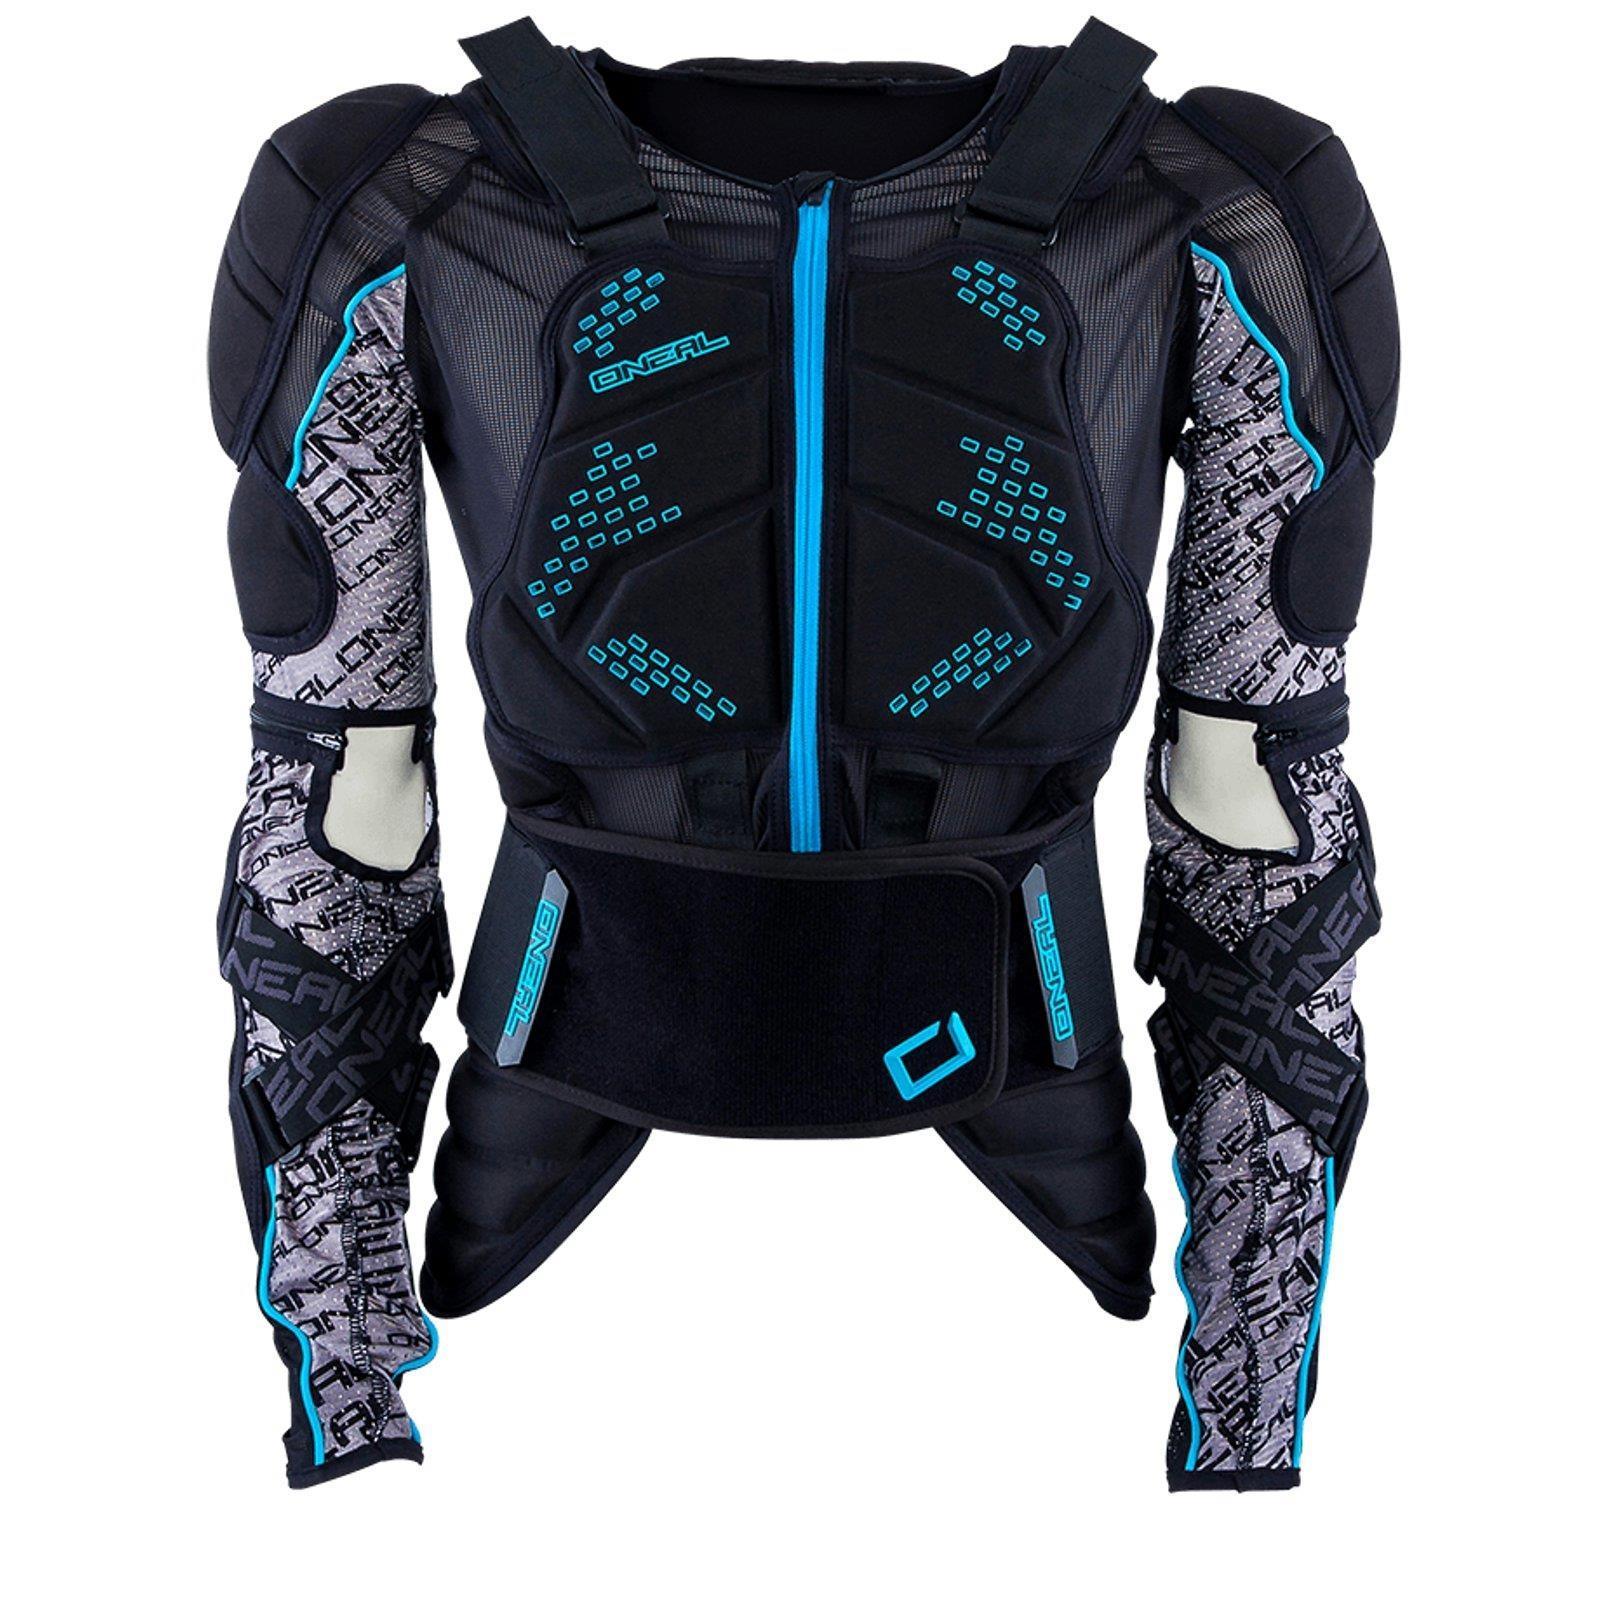 O /'Neal Holeshot Protecteur poitrine chars Roost Guard Motocross MTB BMX DH cross